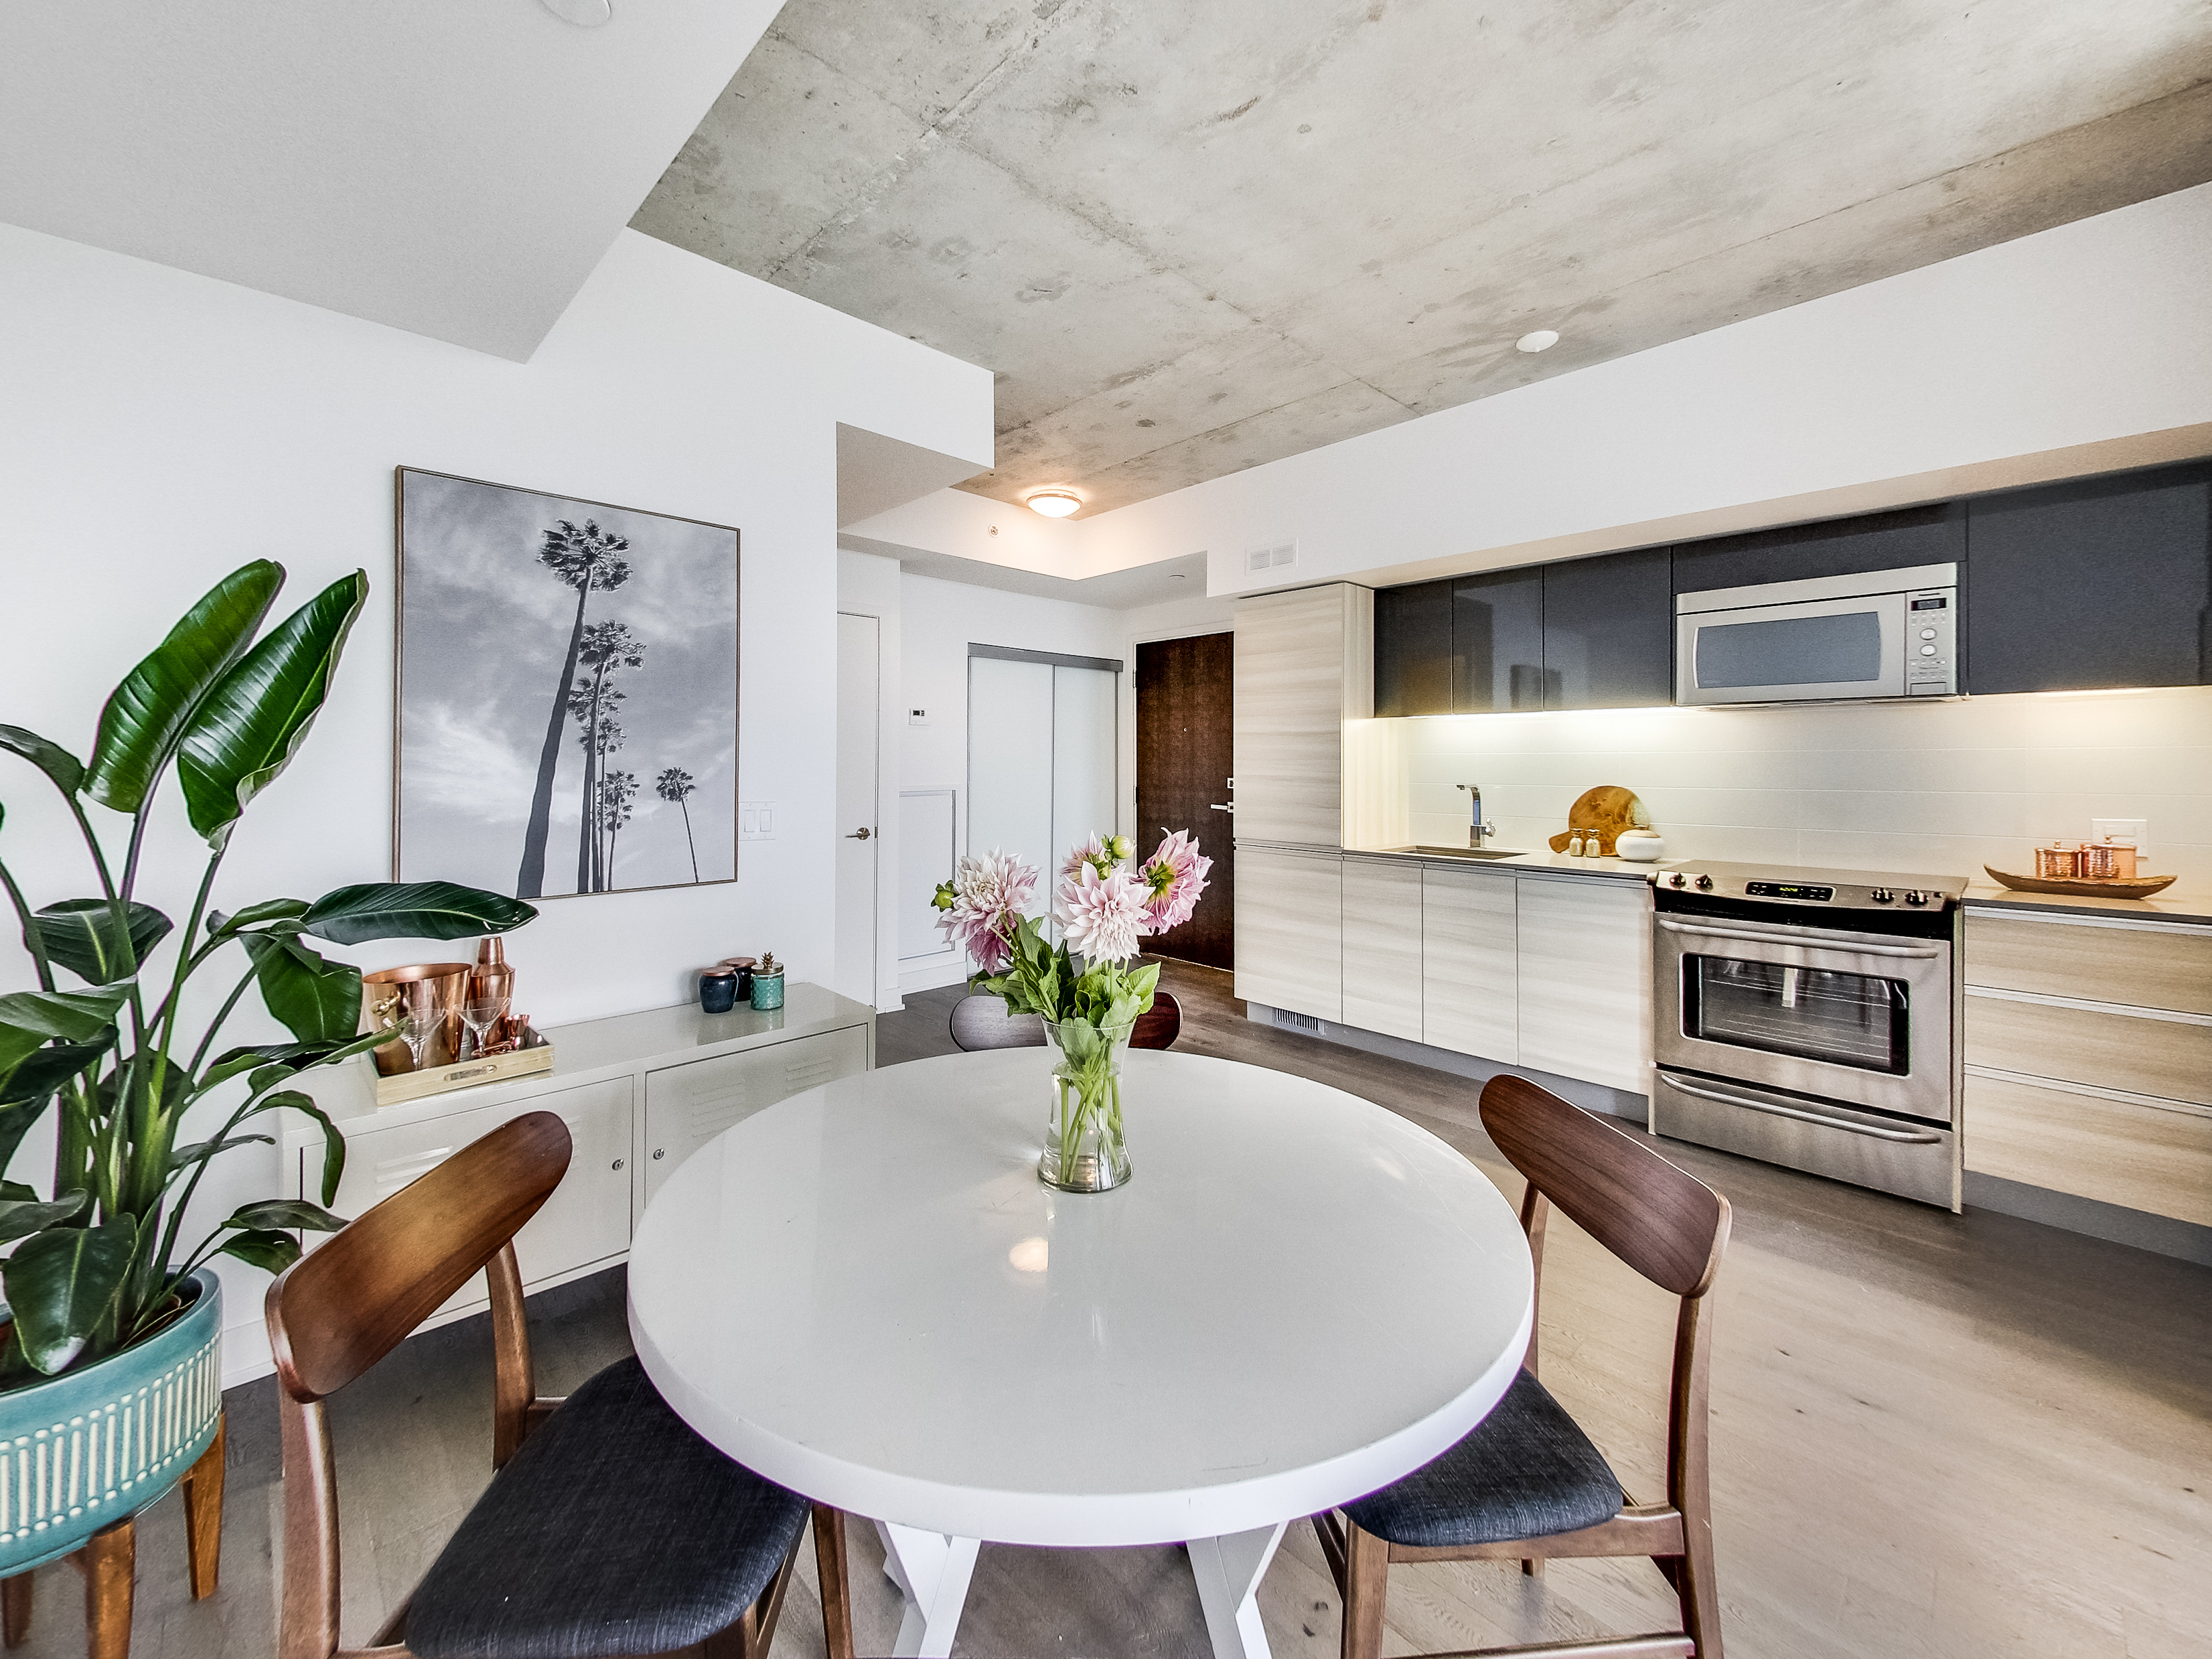 round dining table on wooden flooring open kitchen